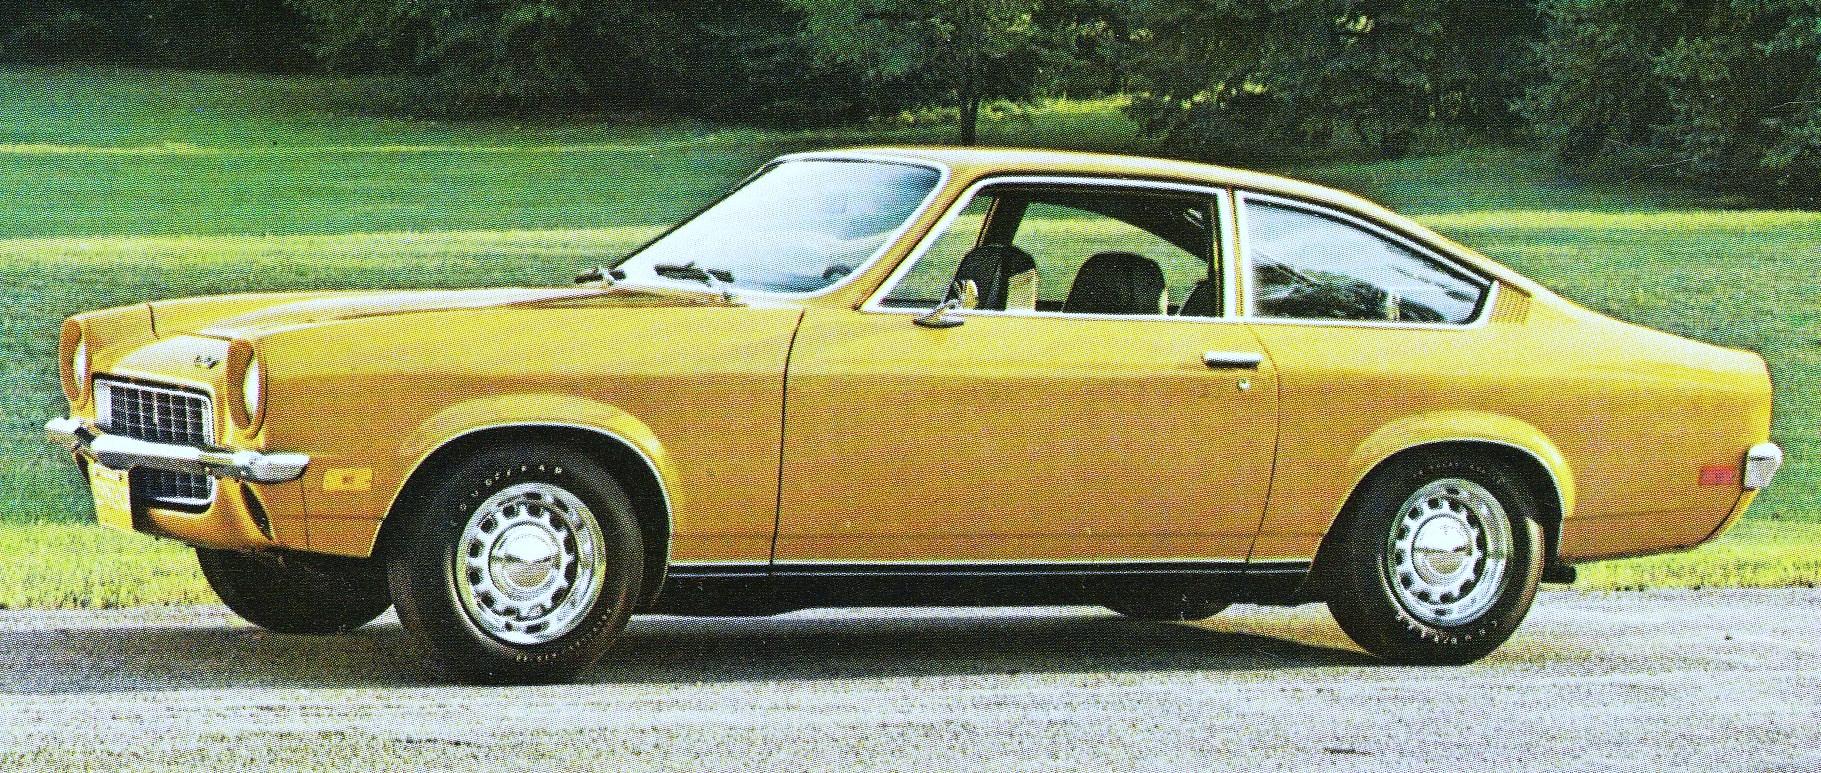 Pickup Dash Ford Parts 1980 Under